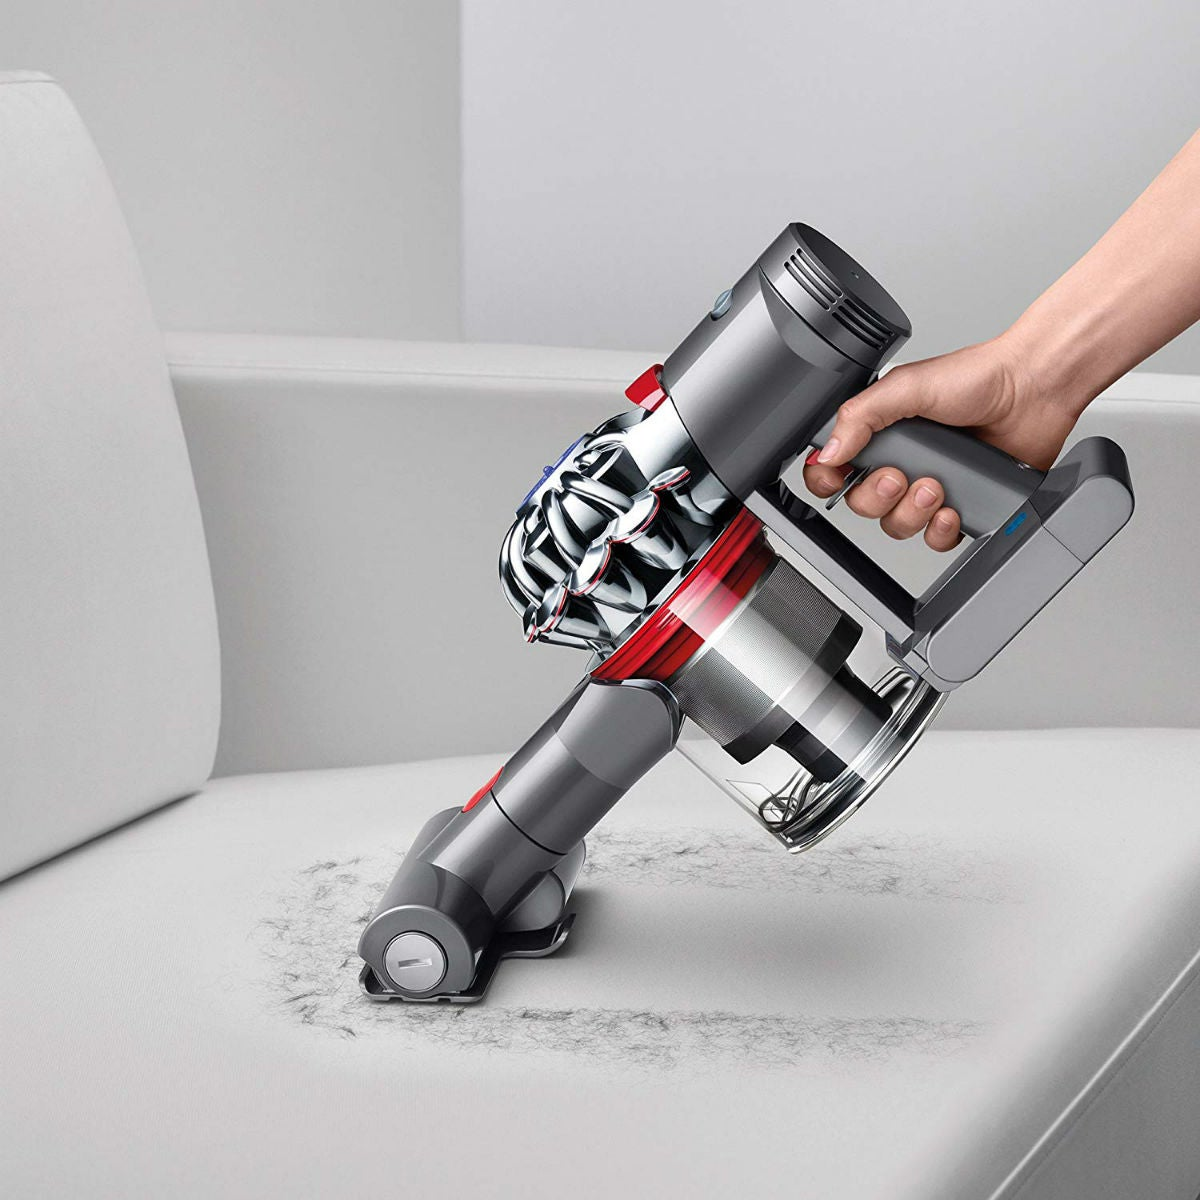 Best Handheld Vacuum: Dyson